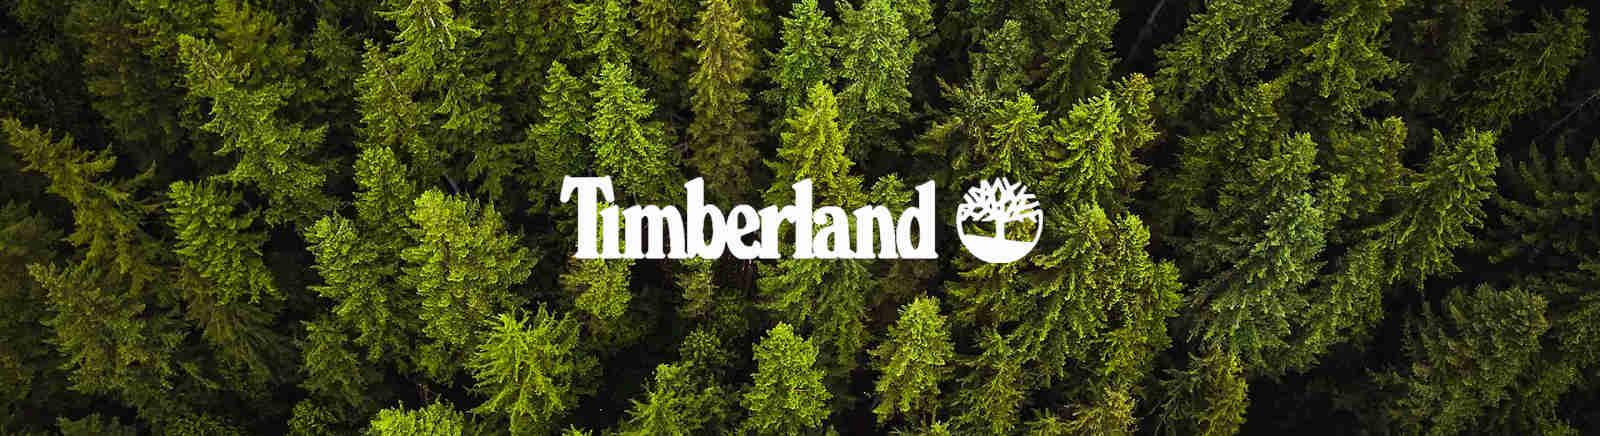 Timberland Schuhe kaufen im GISY Online-Shop